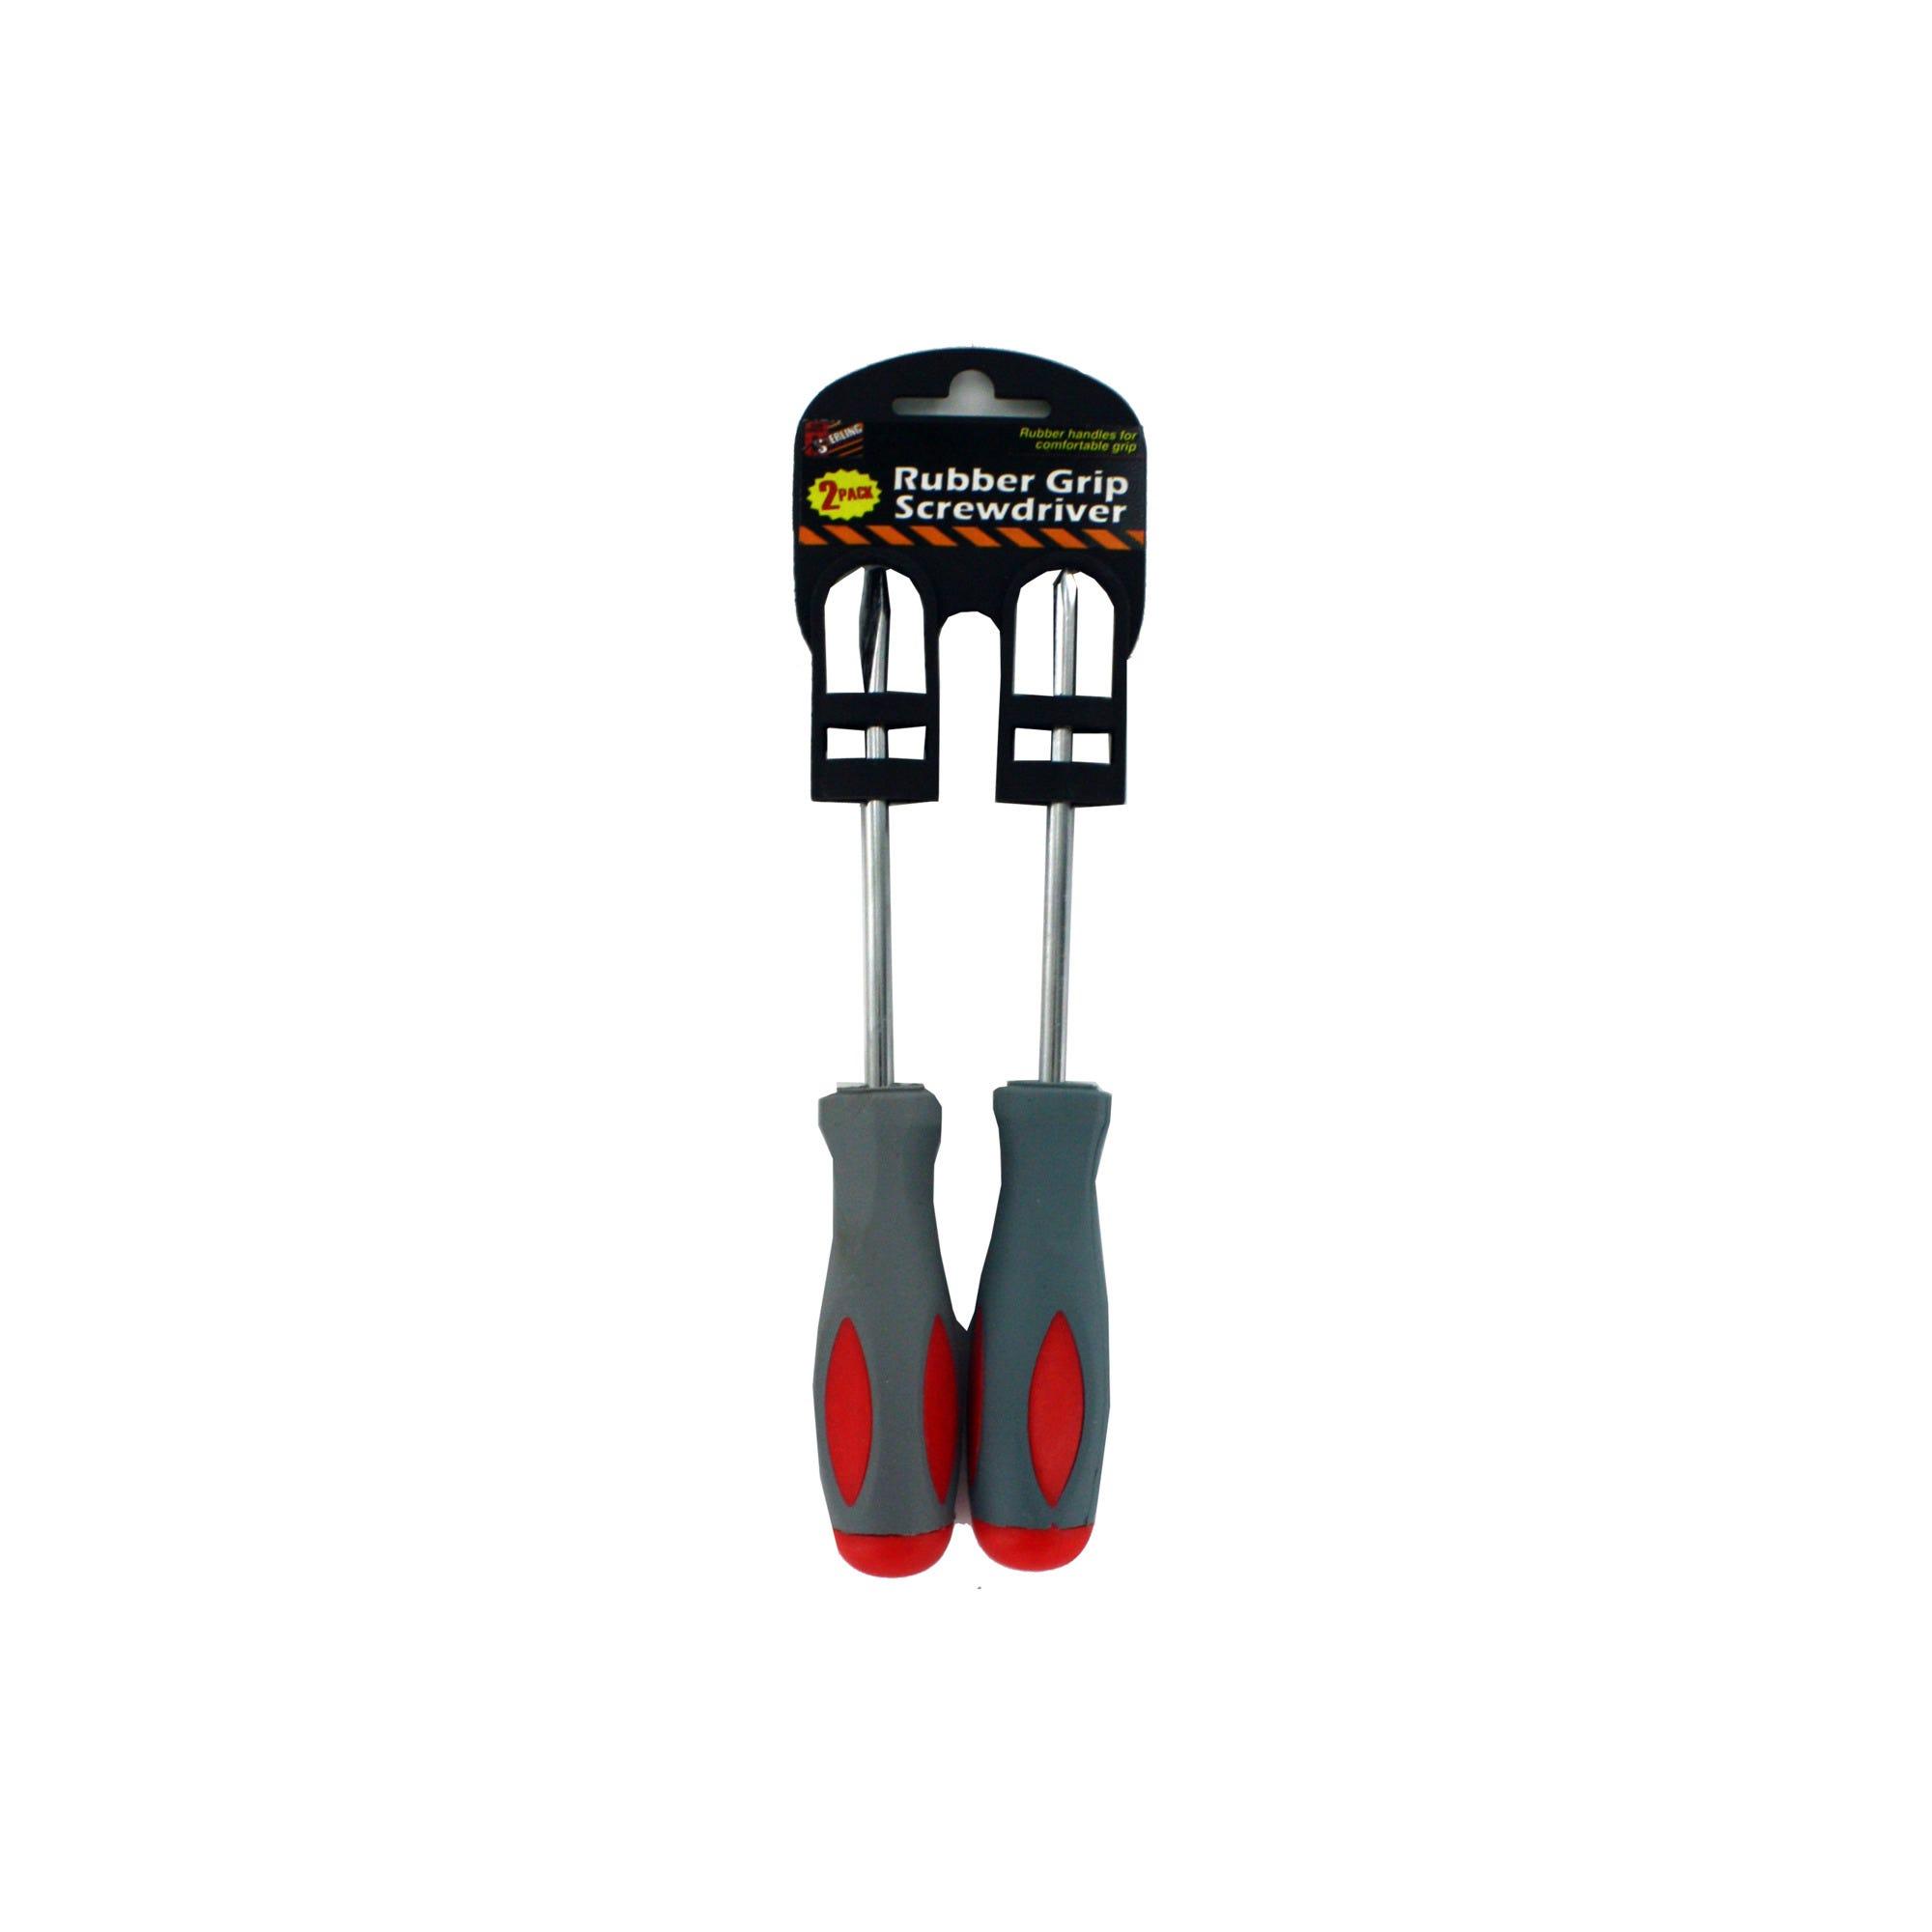 Rubber Grip SCREWDRIVER Set- Qty 22